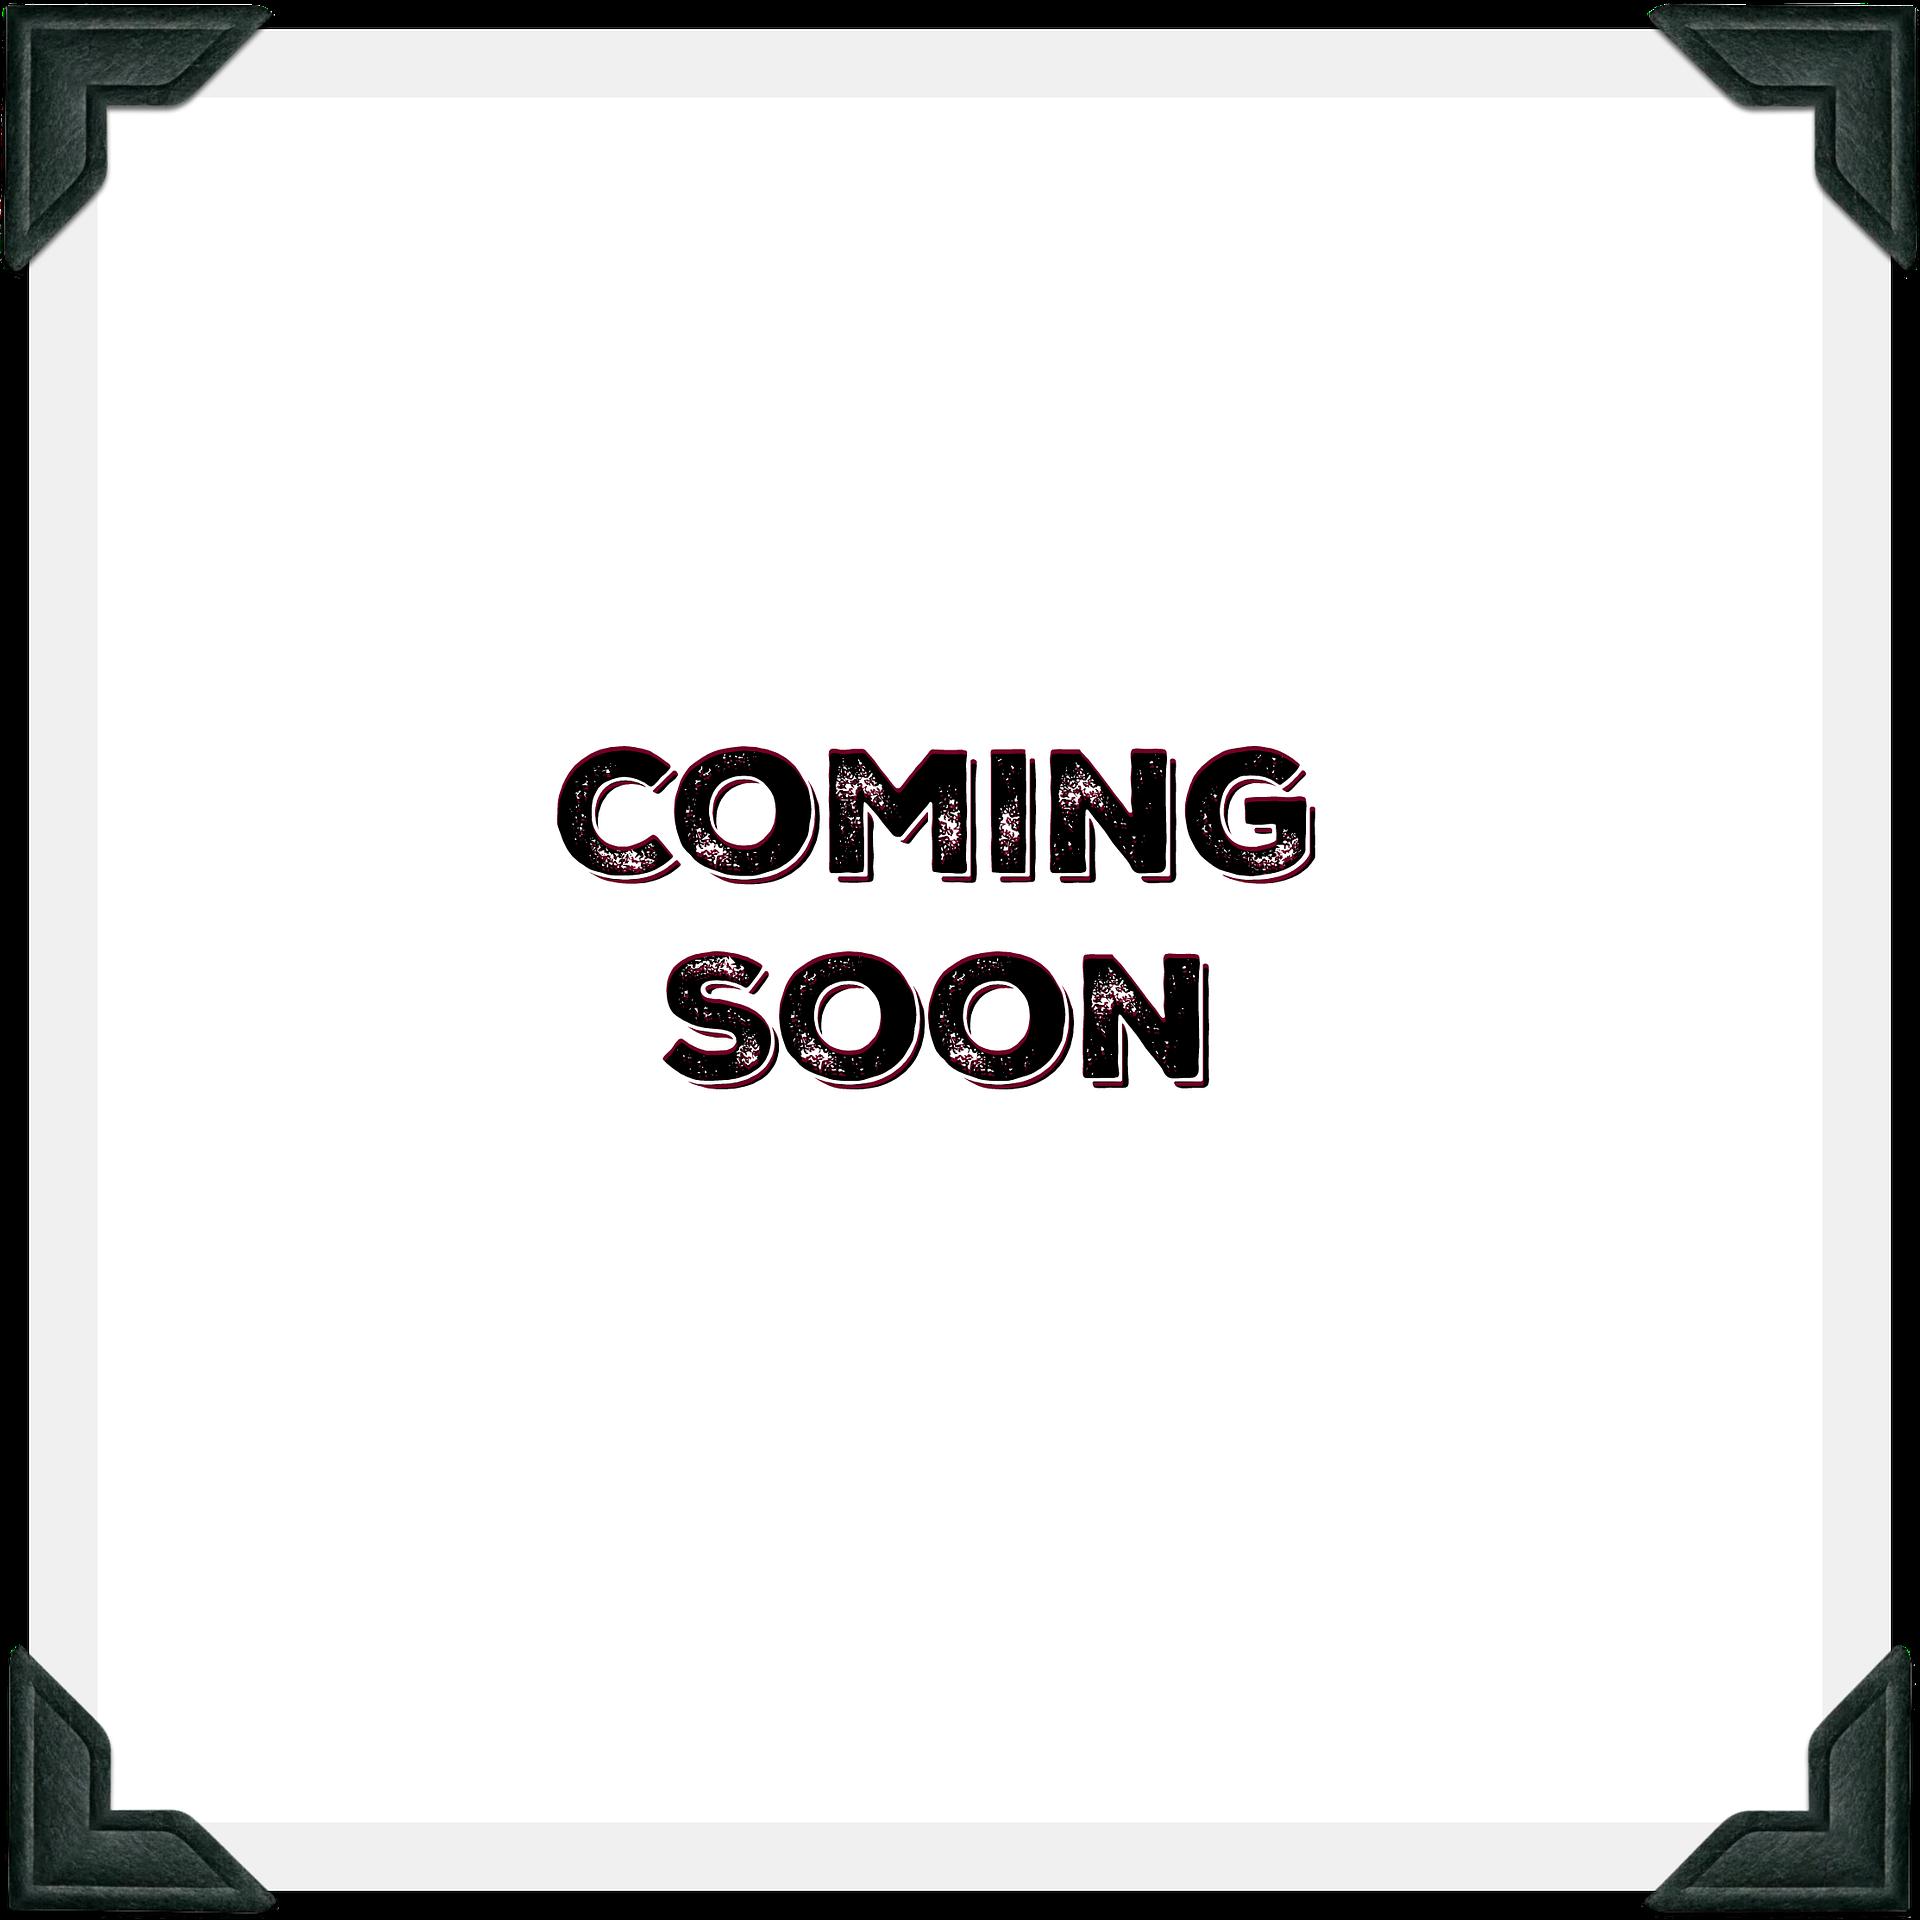 coming-soon-2070393_1920